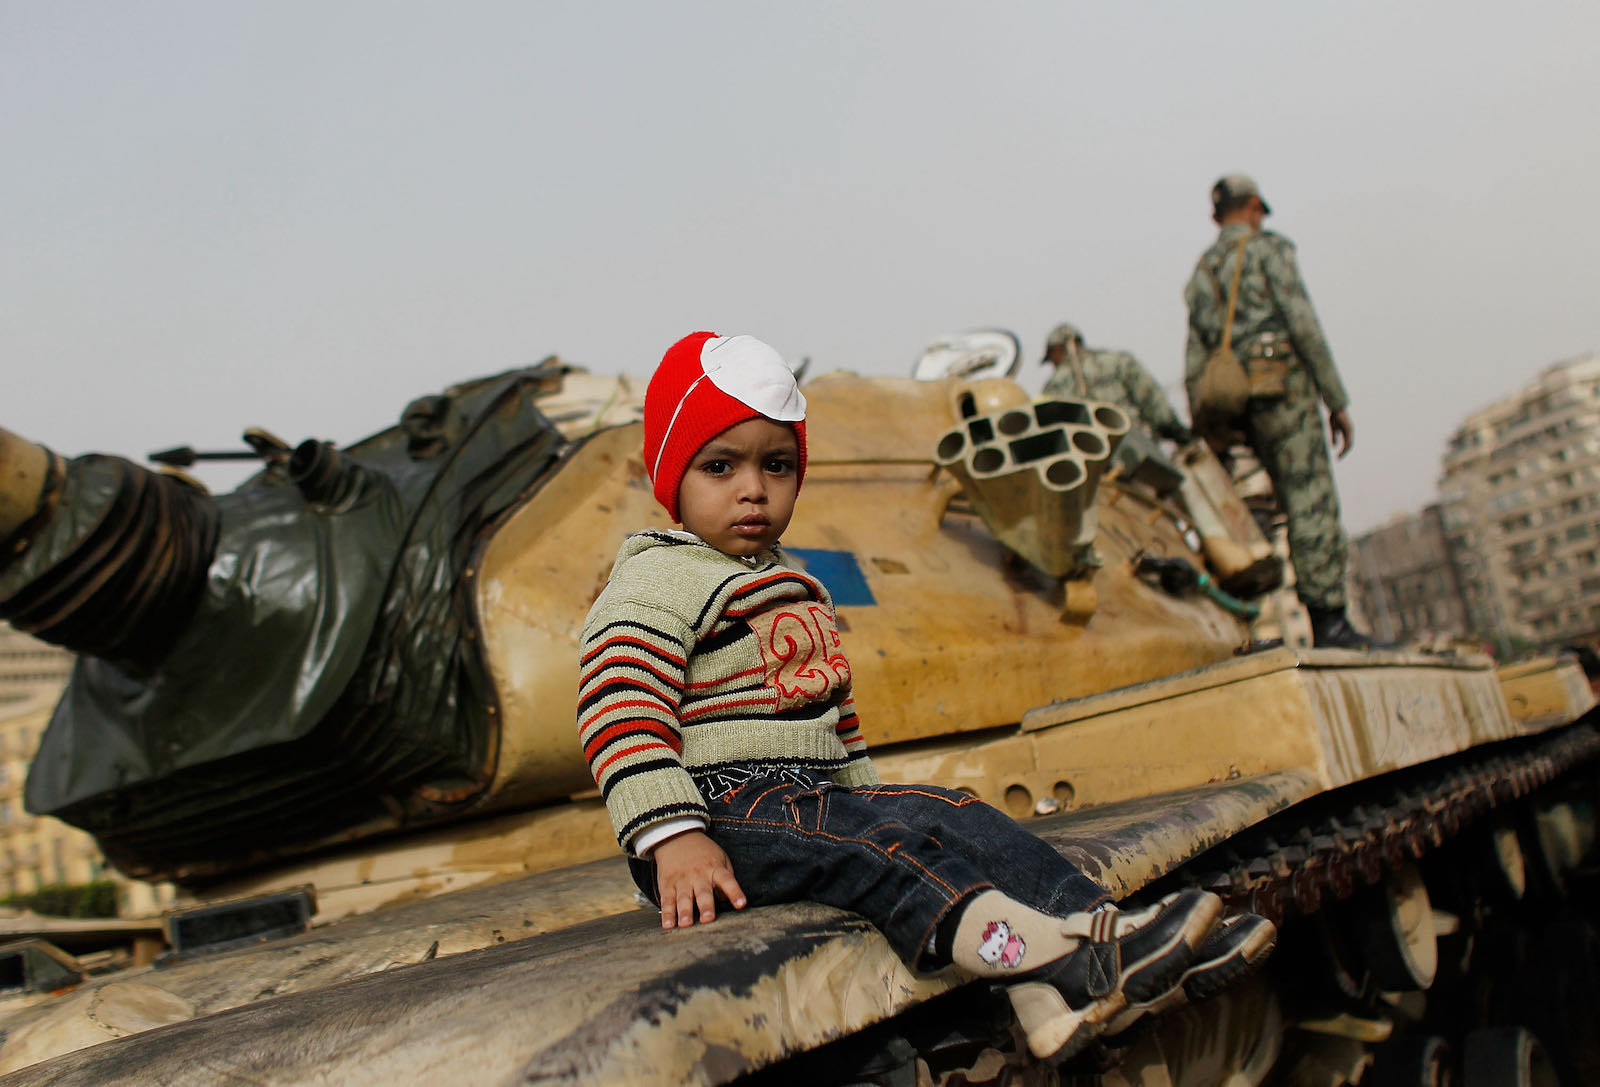 A child sitting on a tank